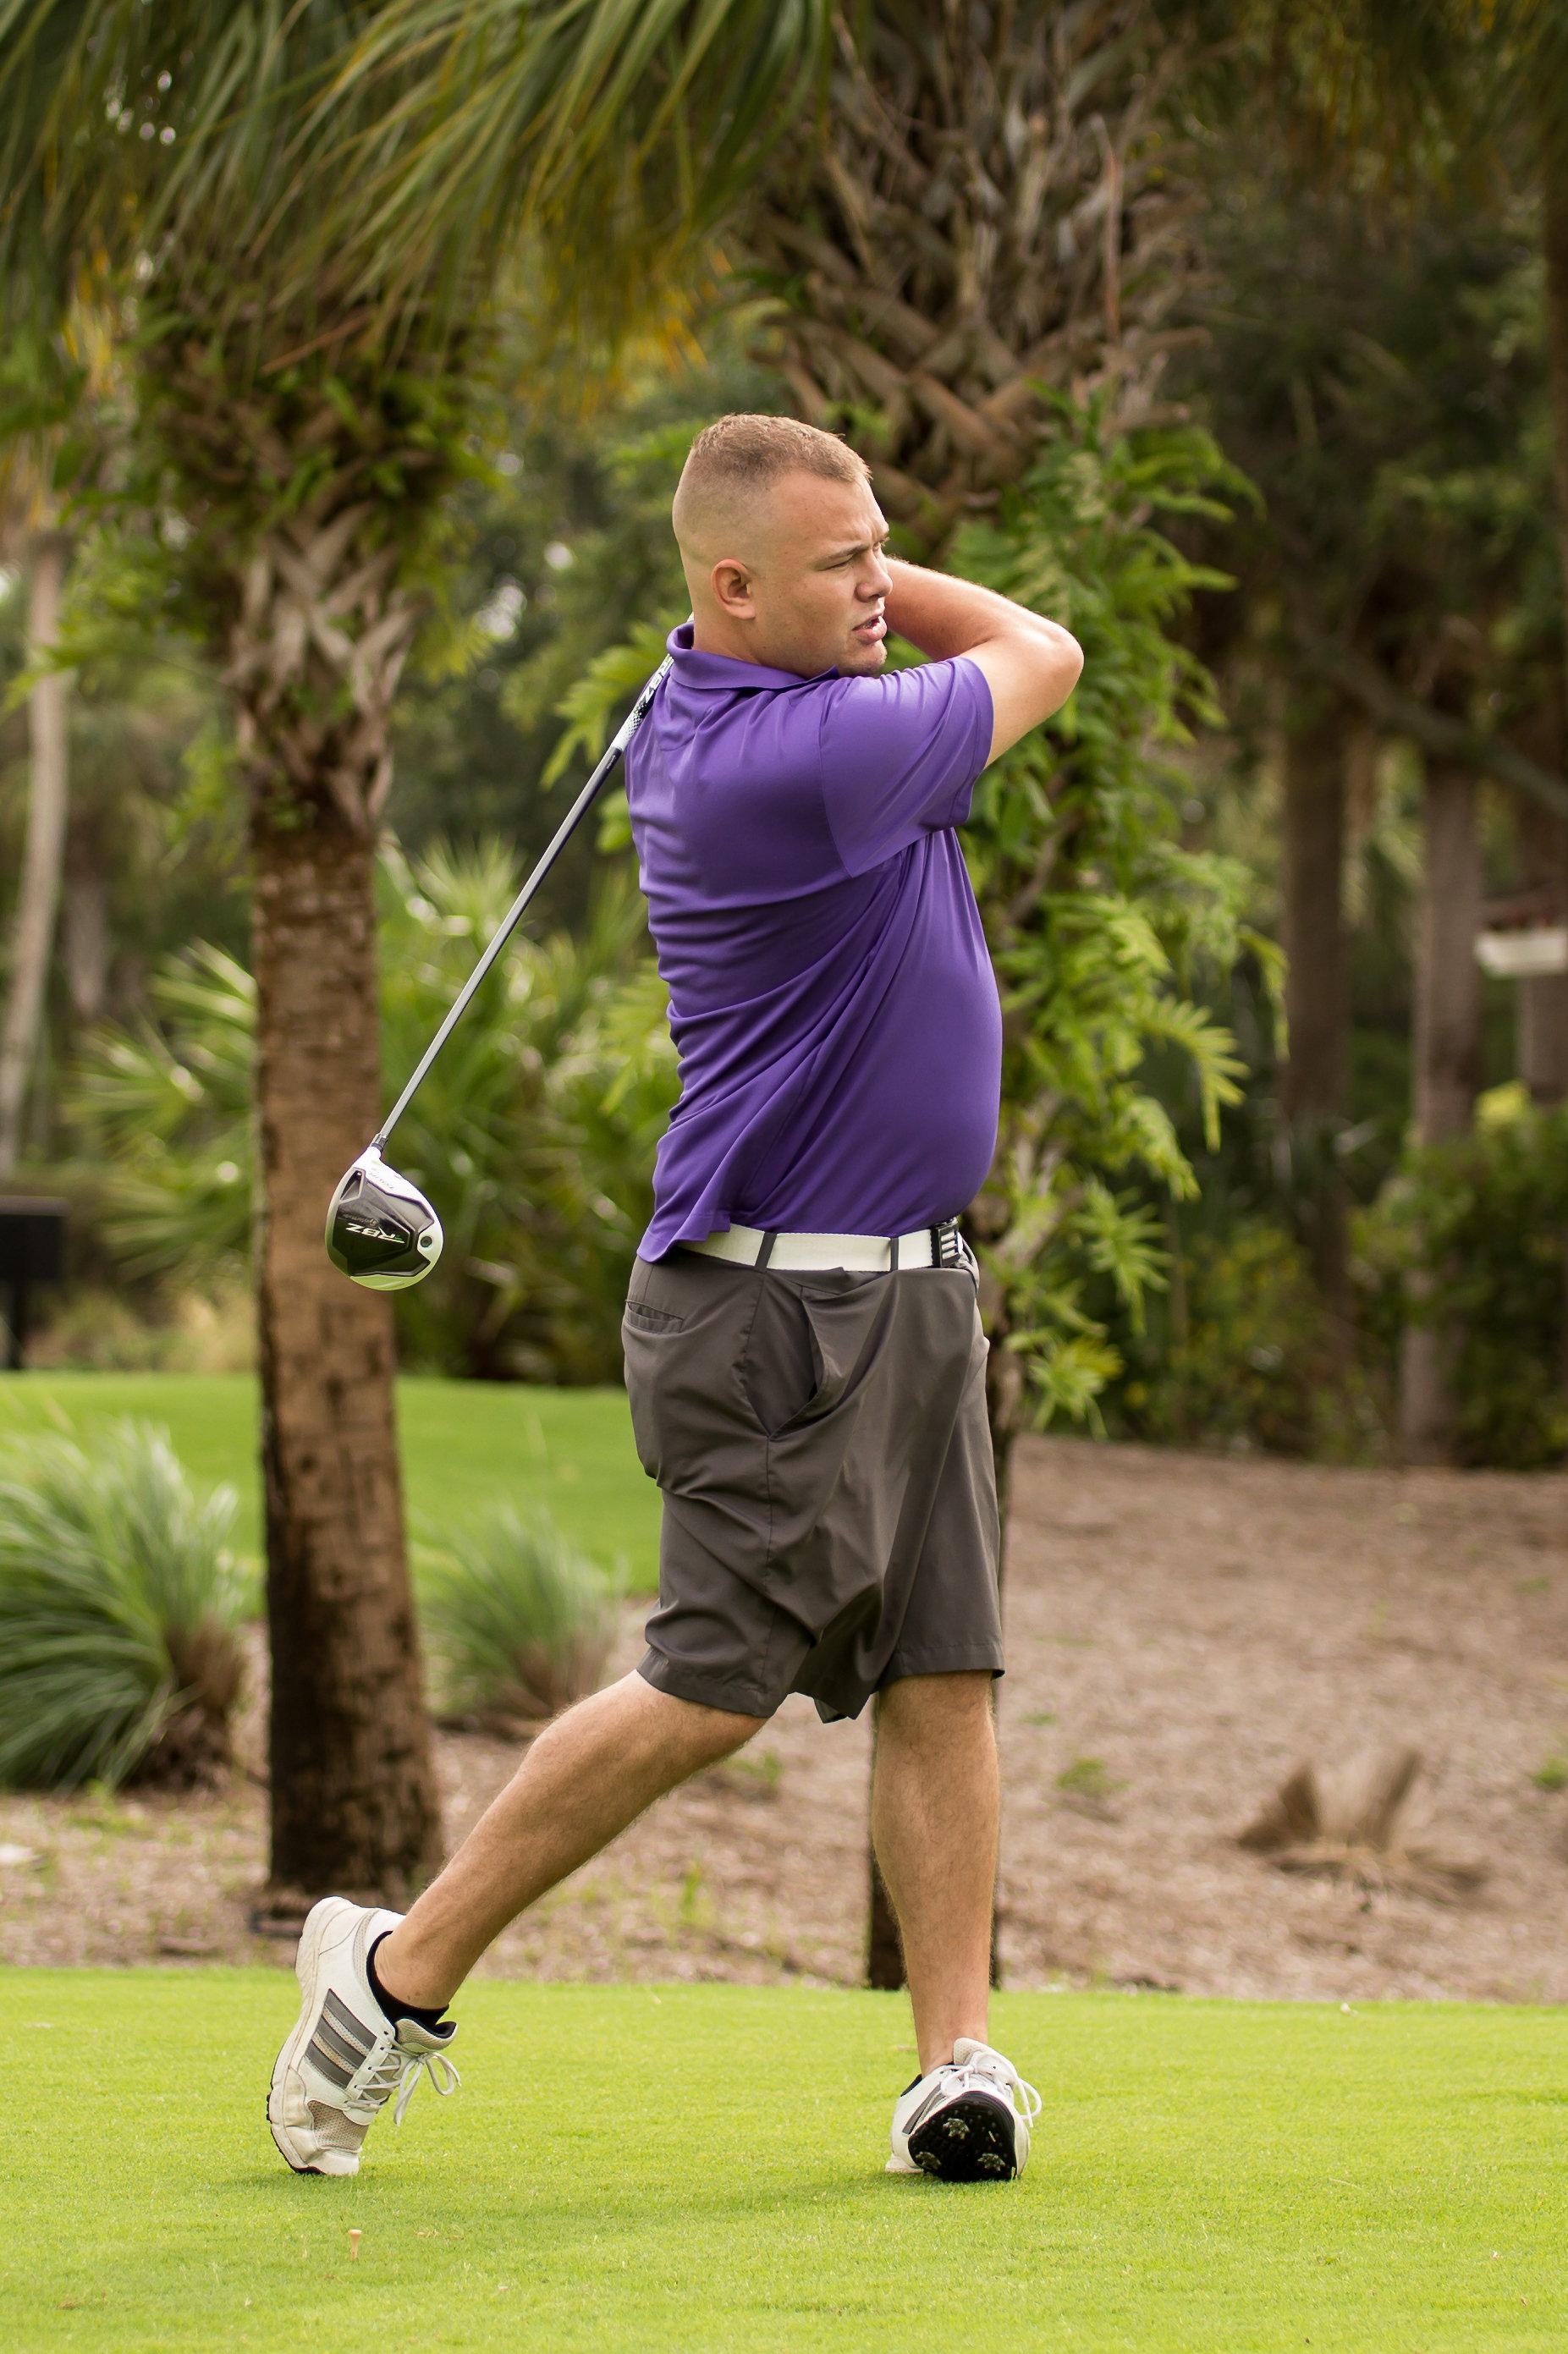 fellowship-foundation-golf-tournament-parkland-country-club-coastal-click-photography-7